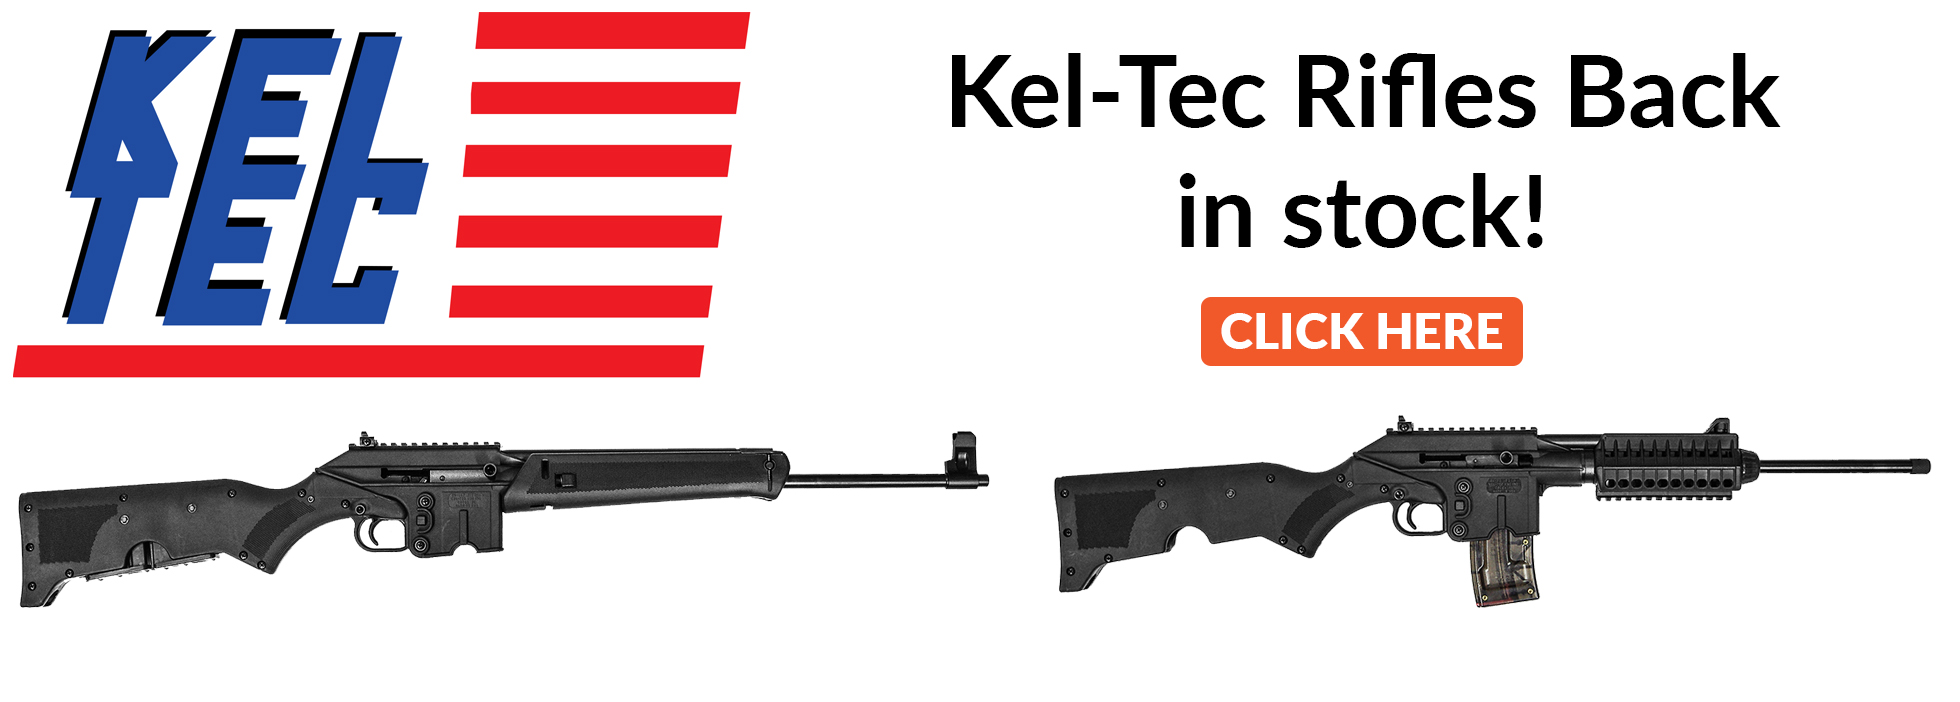 Kel-Tec Rifles